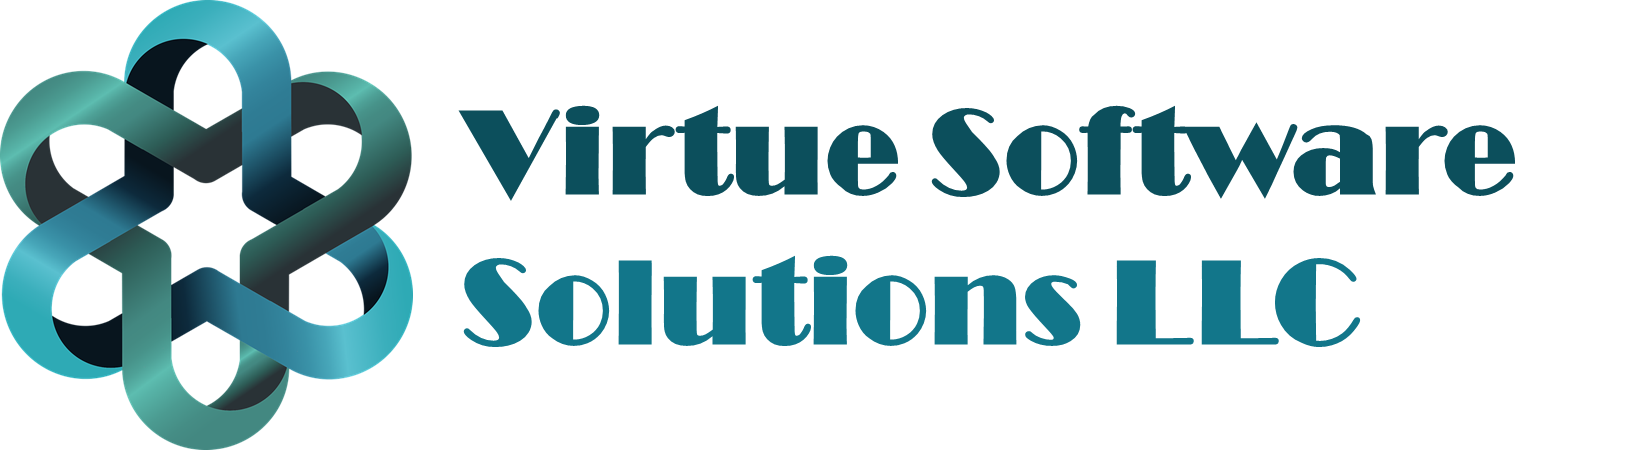 Virtue Software Solutions LLC